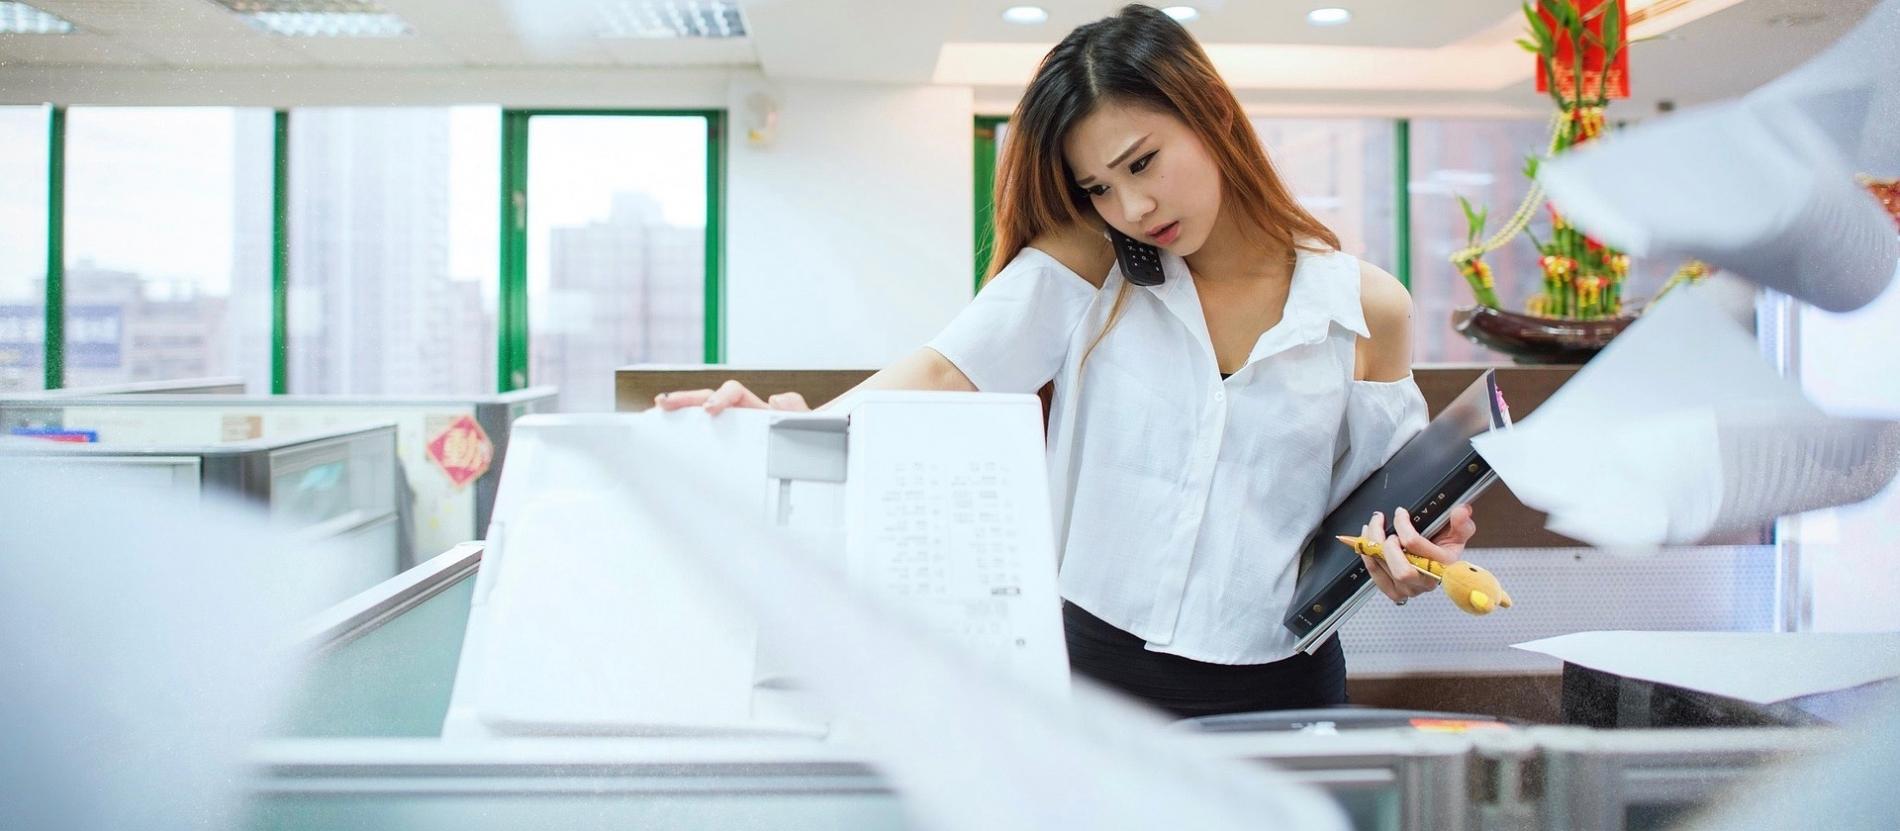 Women using a photocopy machine